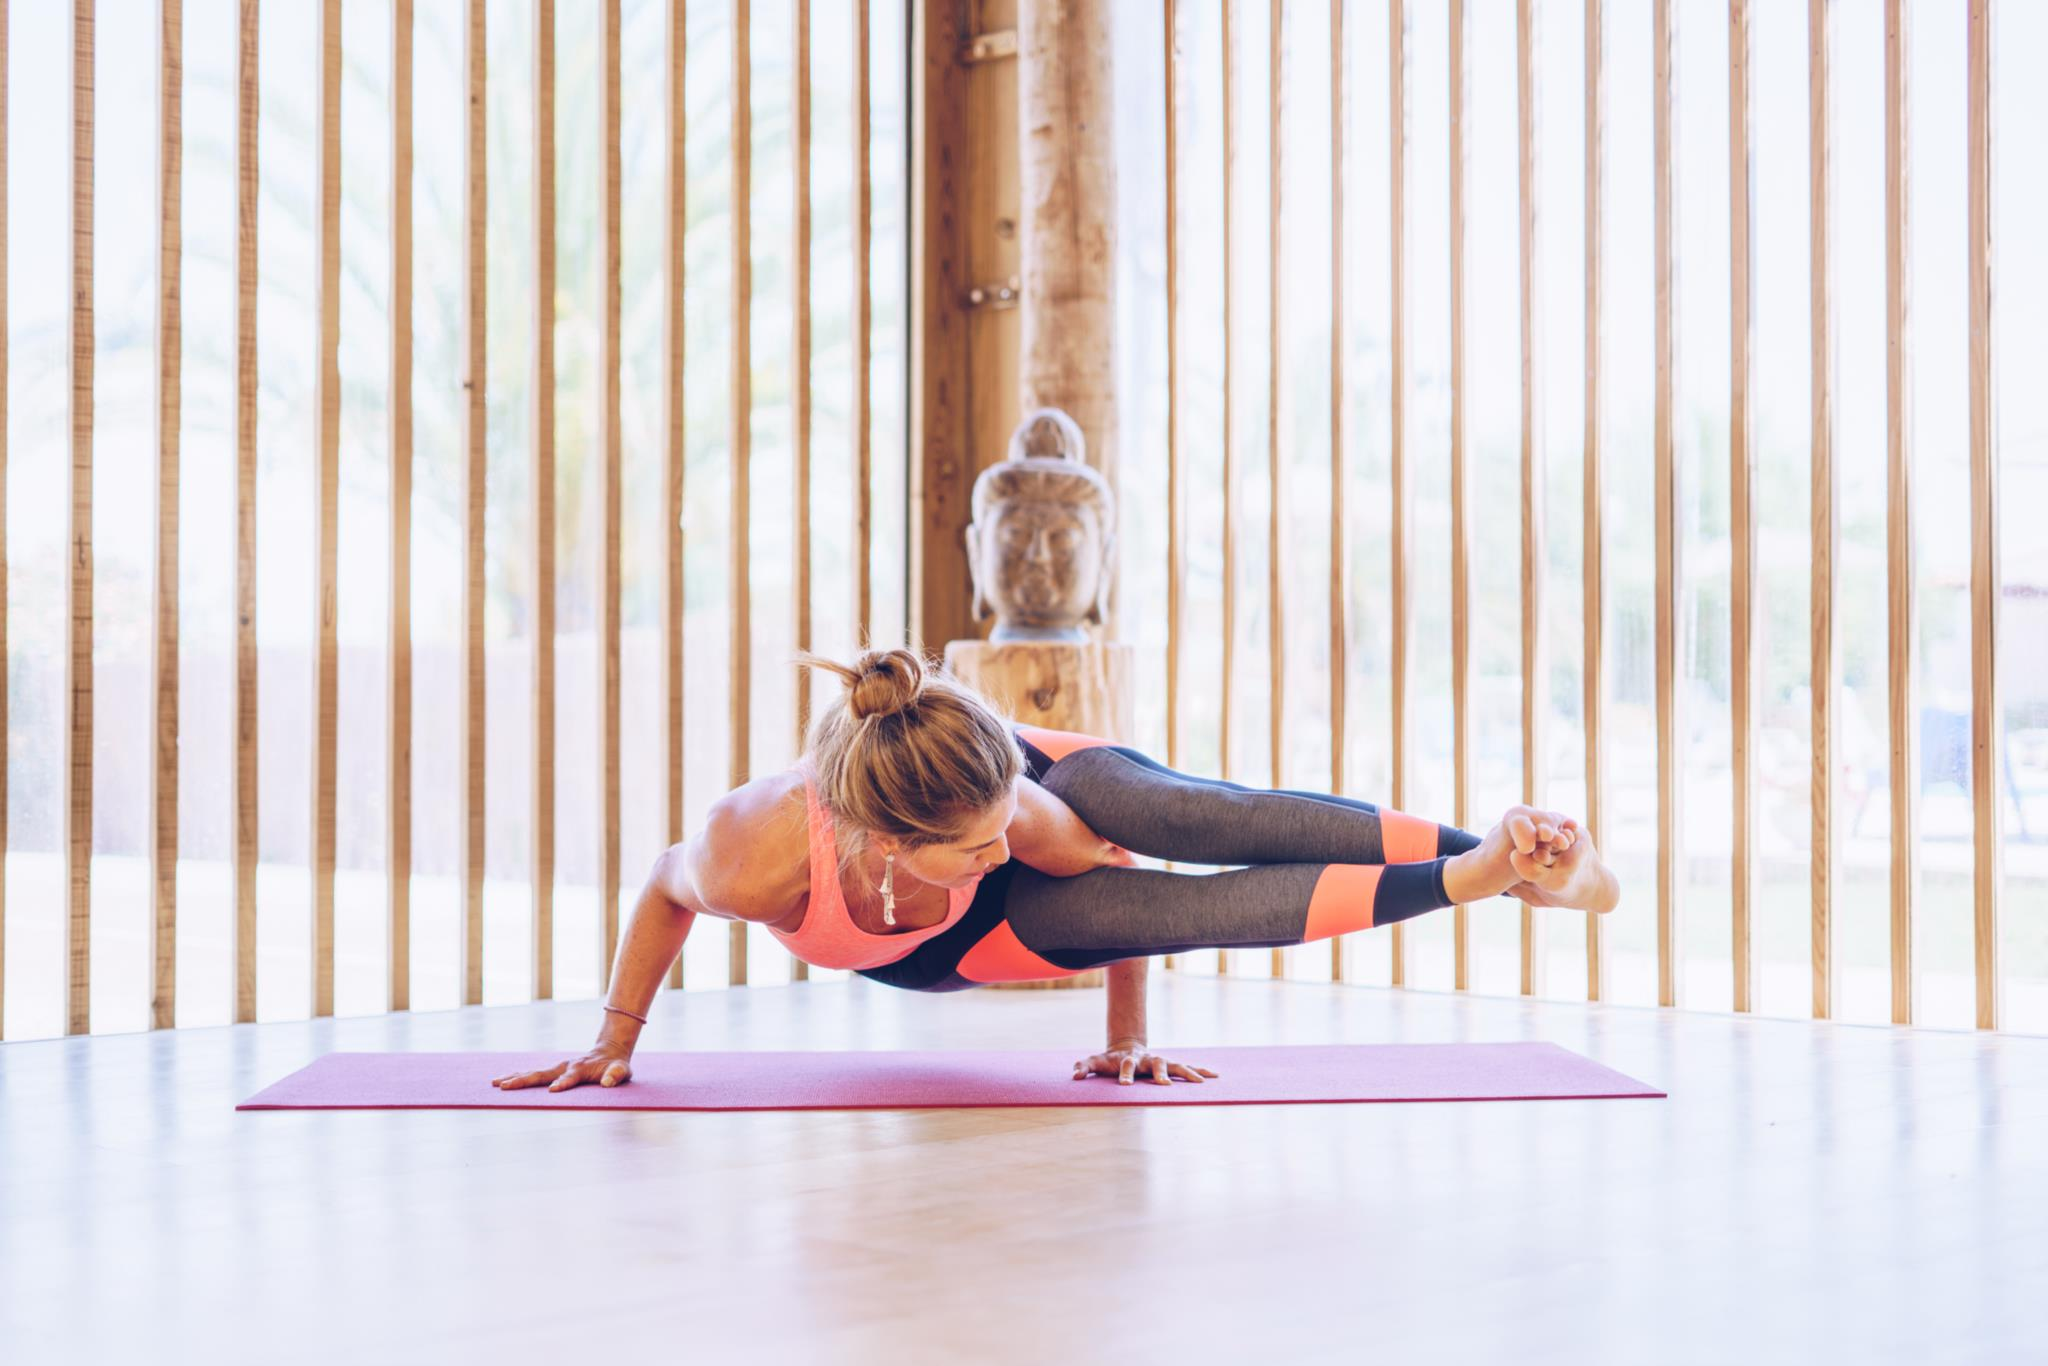 d0840bc47 O ioga pode ser exercício físico